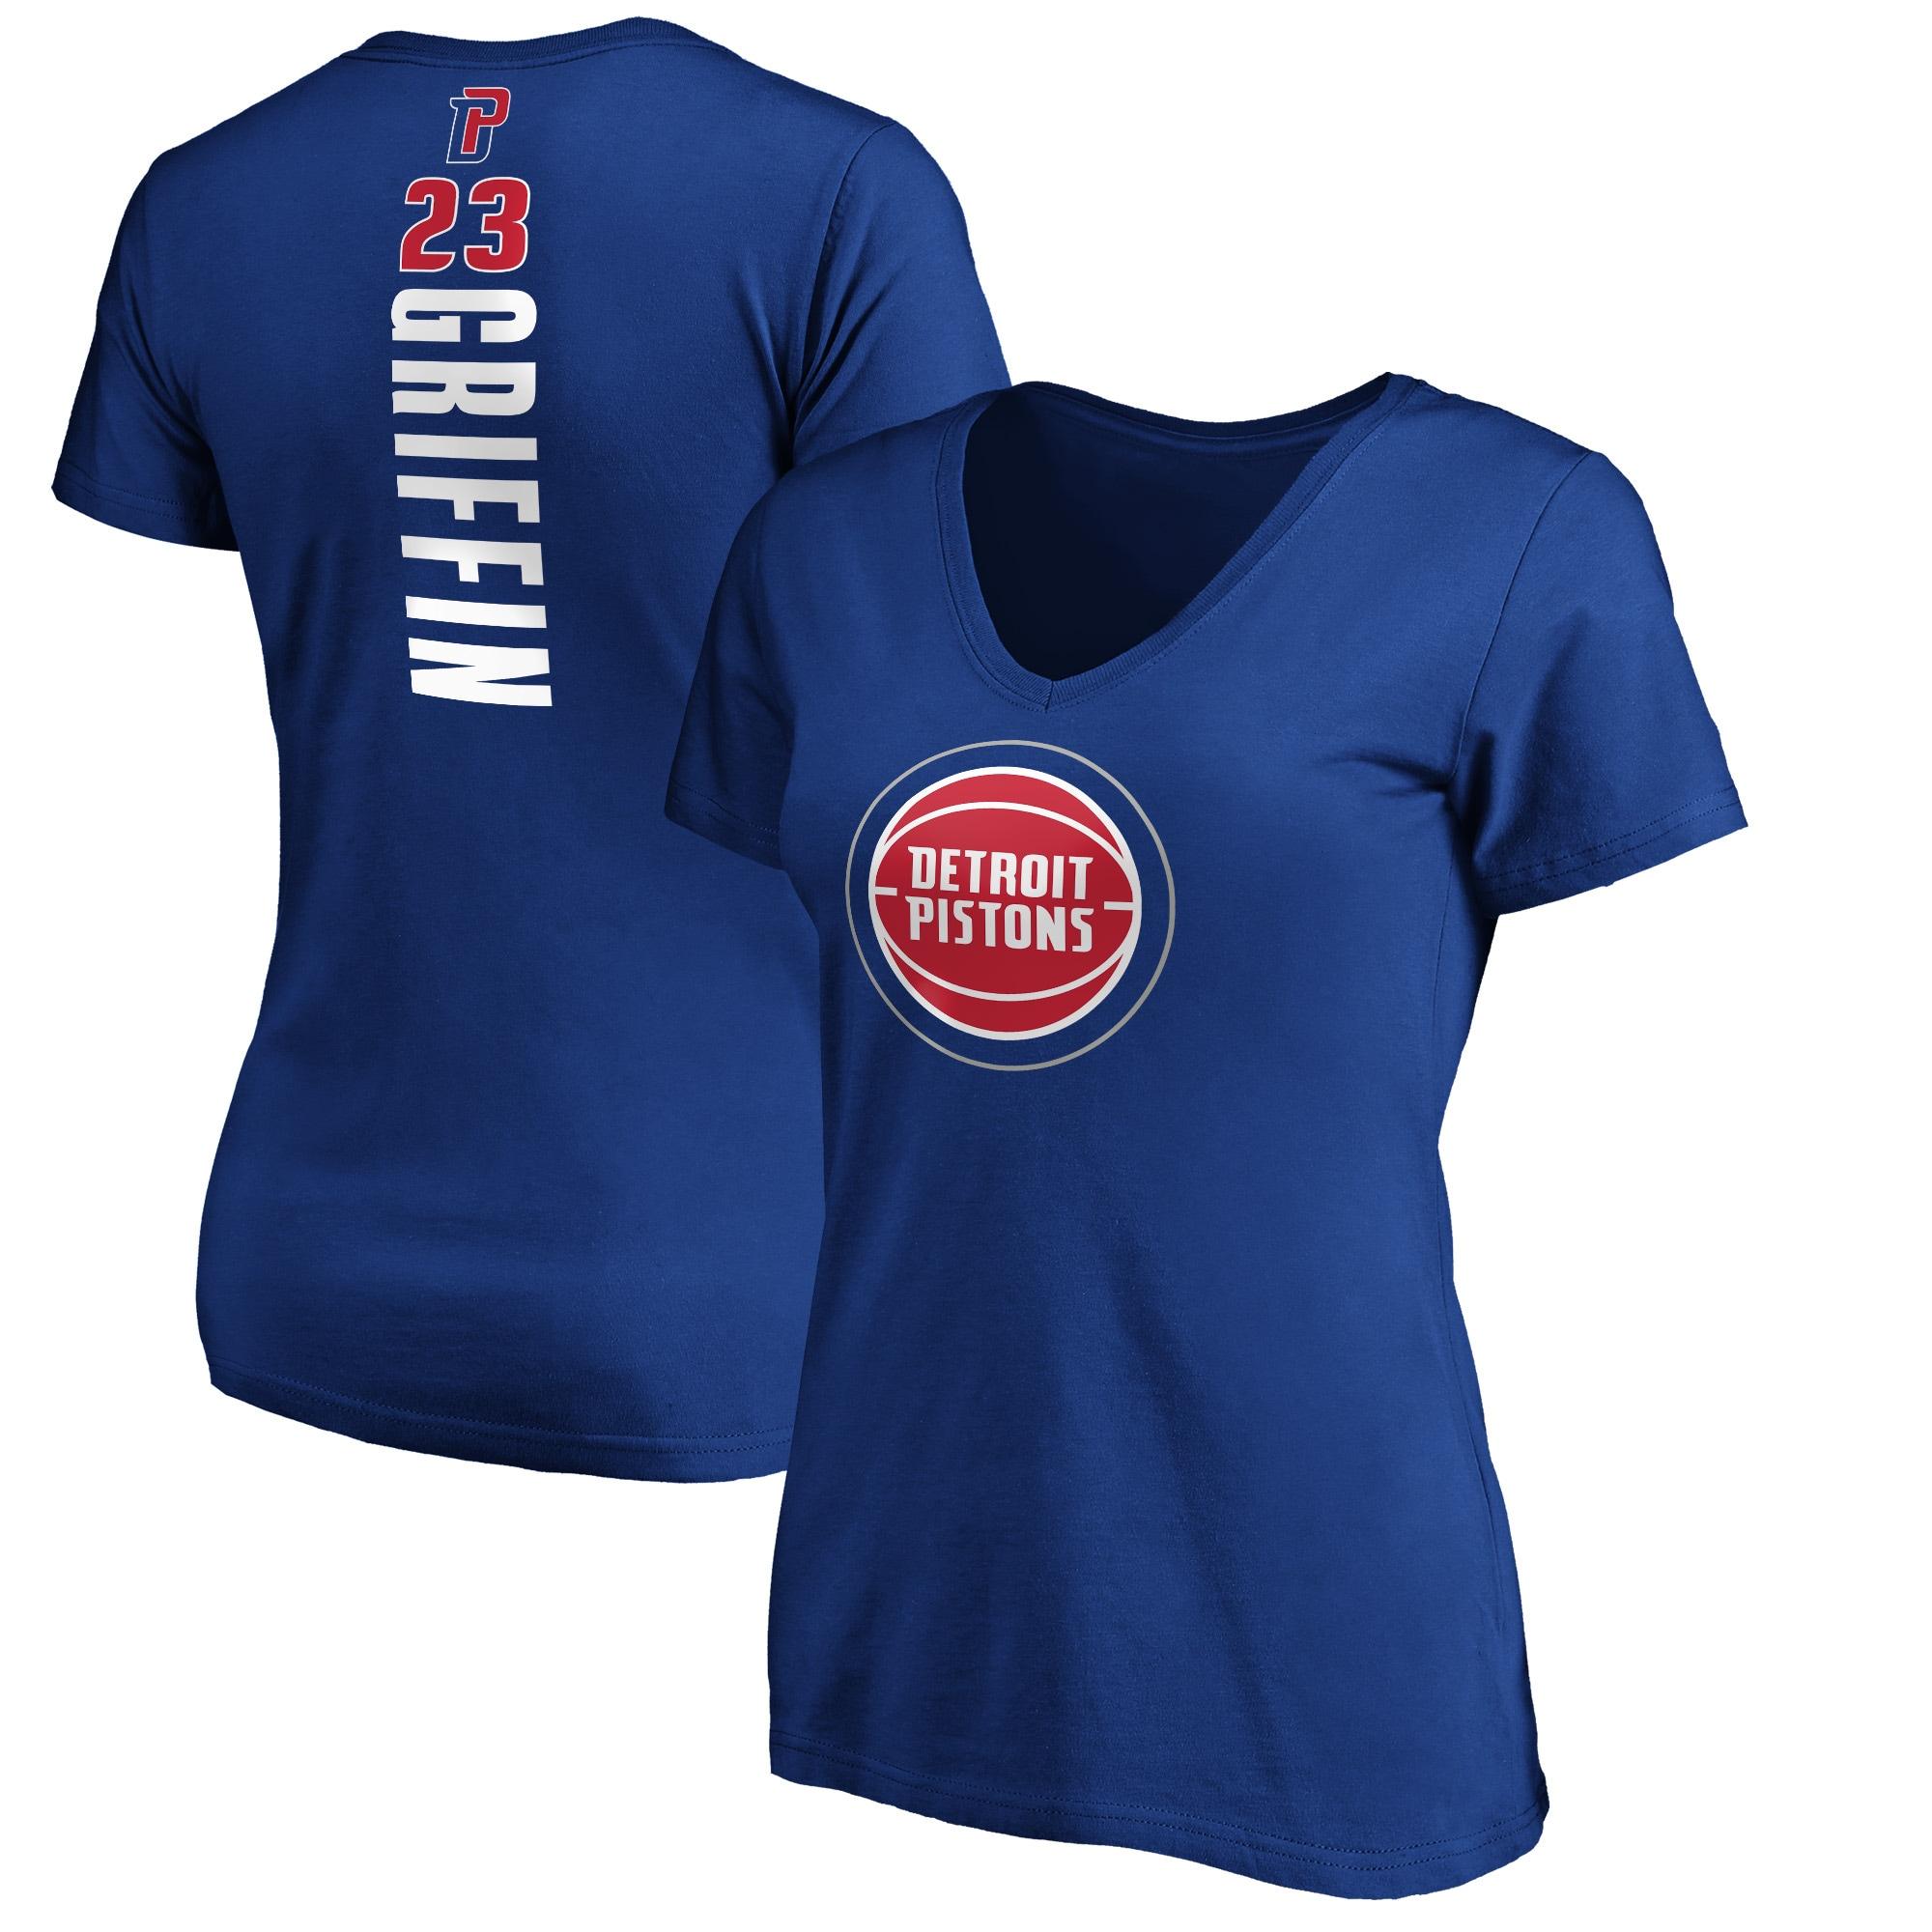 Blake Griffin Detroit Pistons Fanatics Branded Women's Plus Size Playmaker Name & Number V-Neck T-Shirt - Royal